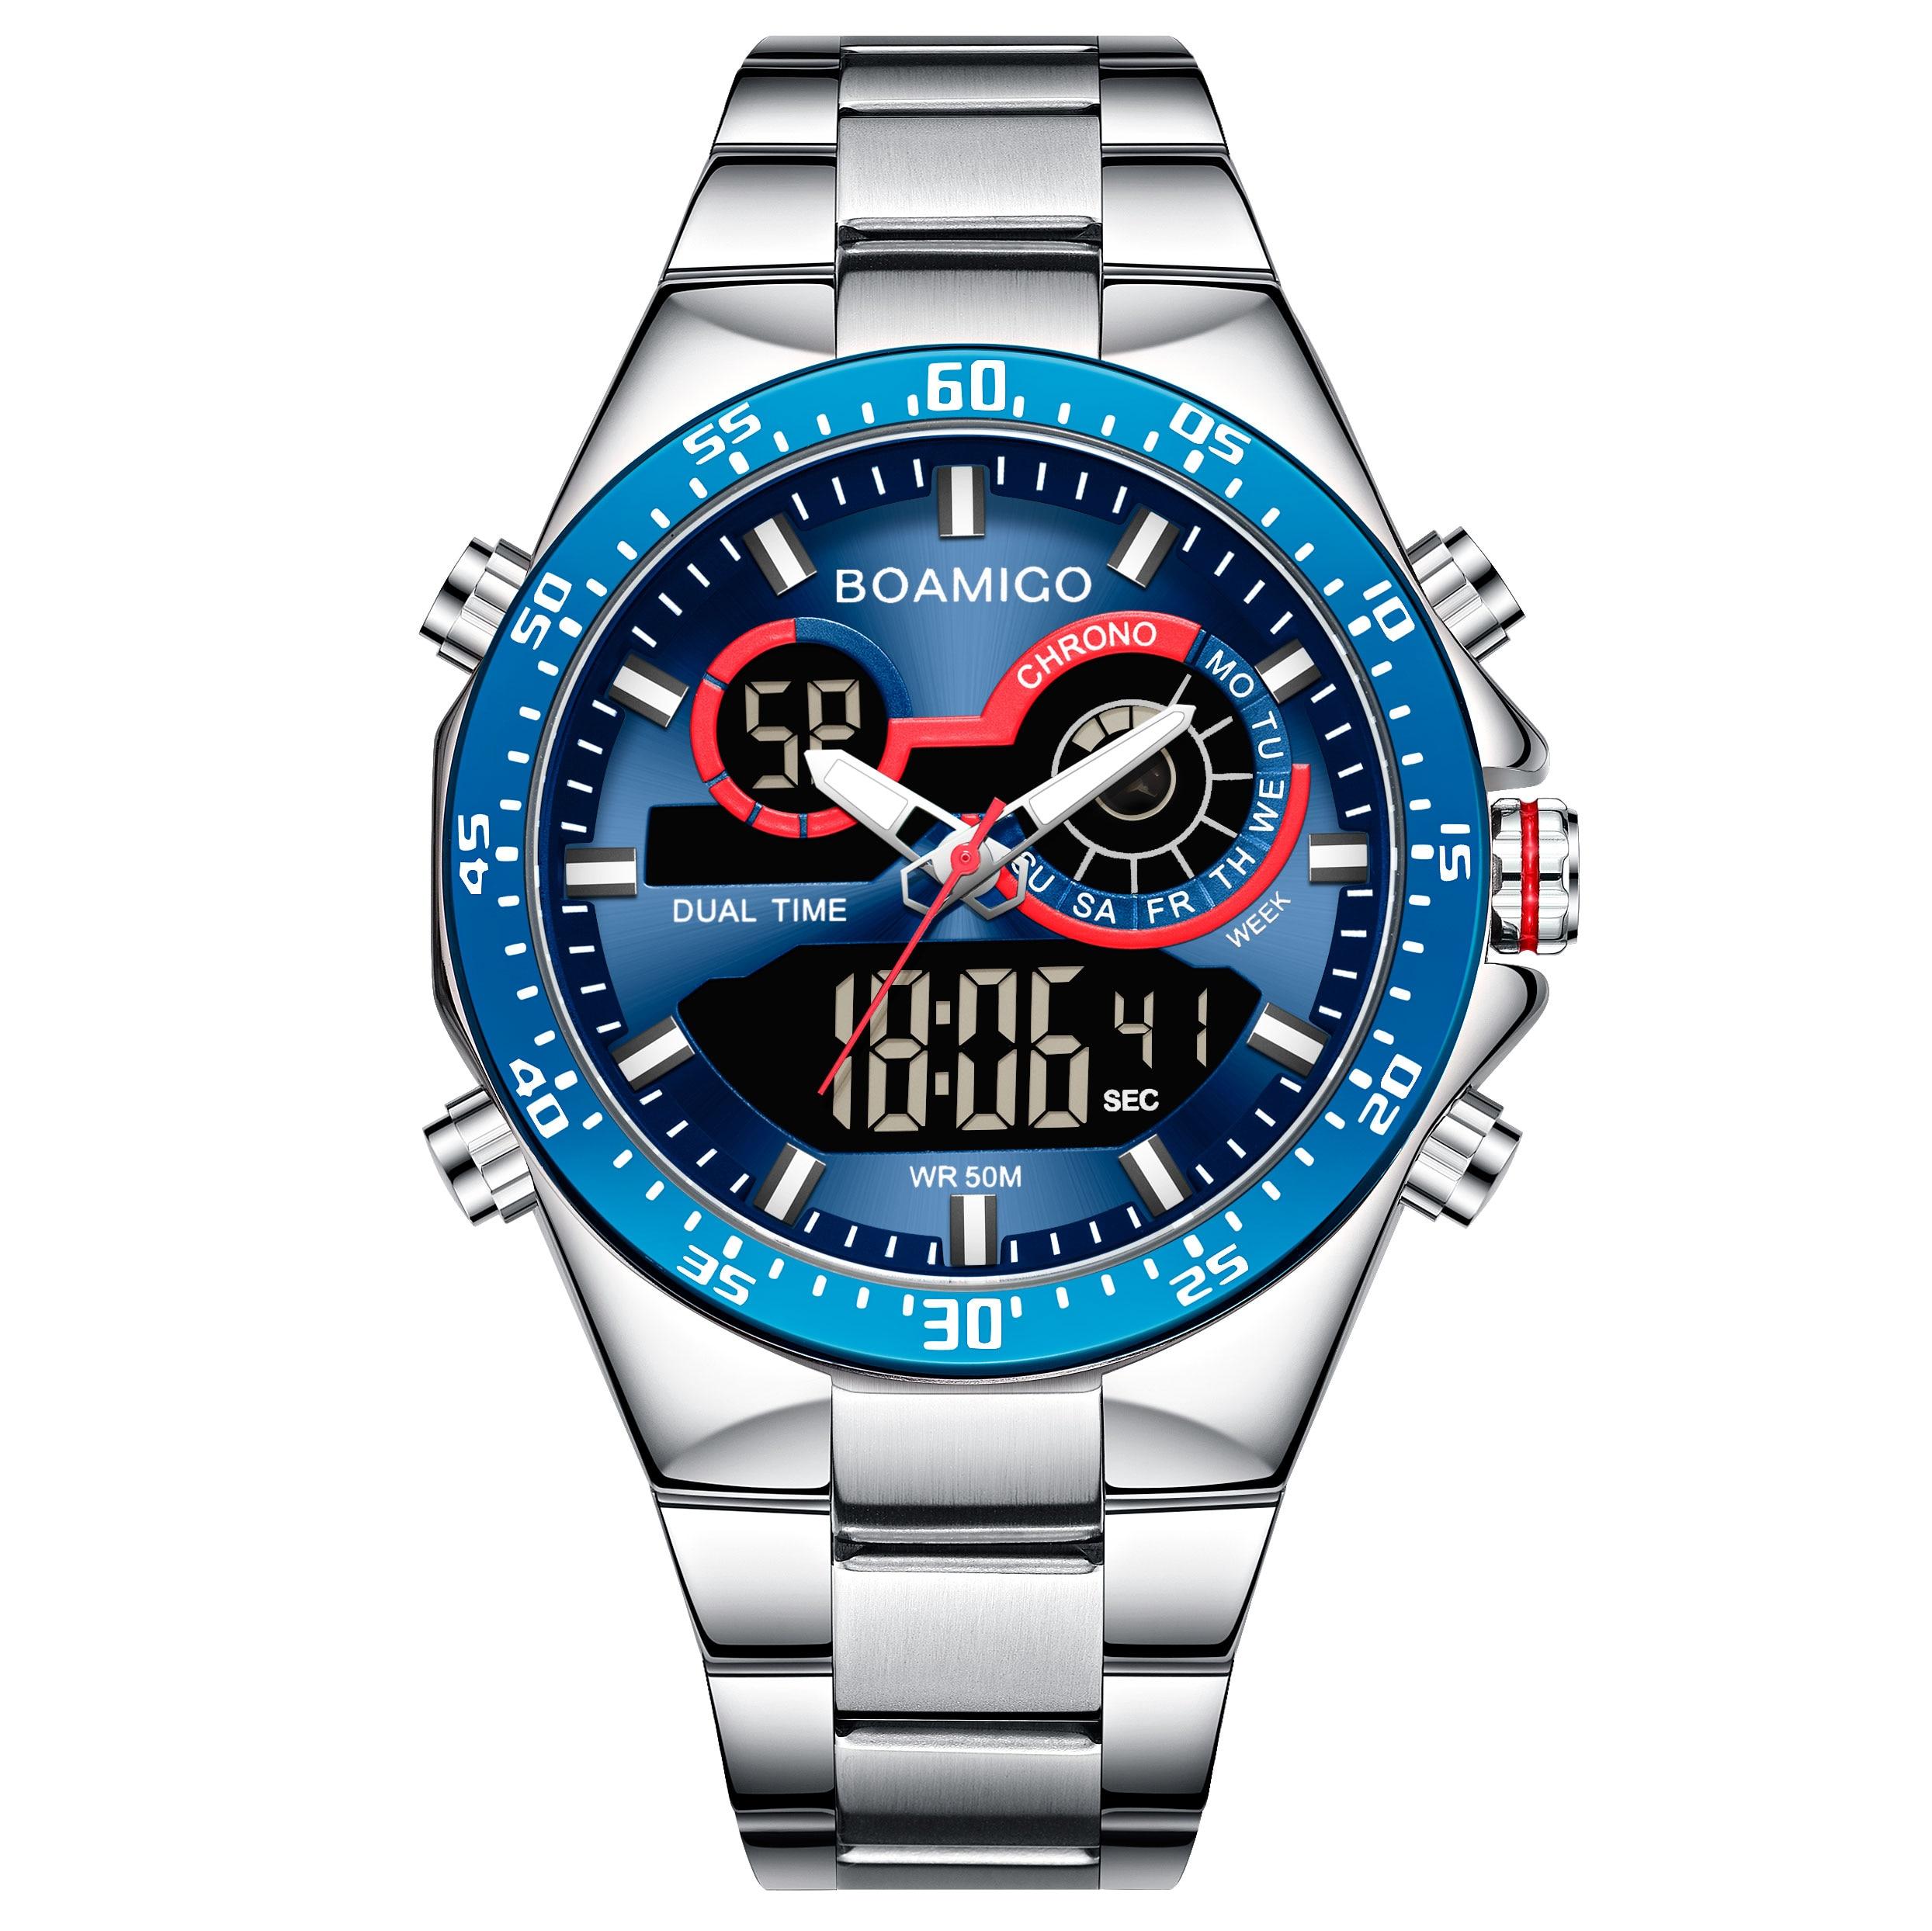 Hot DealsBOAMIGO Mens Watches Chronograph Digital Stainless-Steel Analog Sports Top-Brand New-Fashion